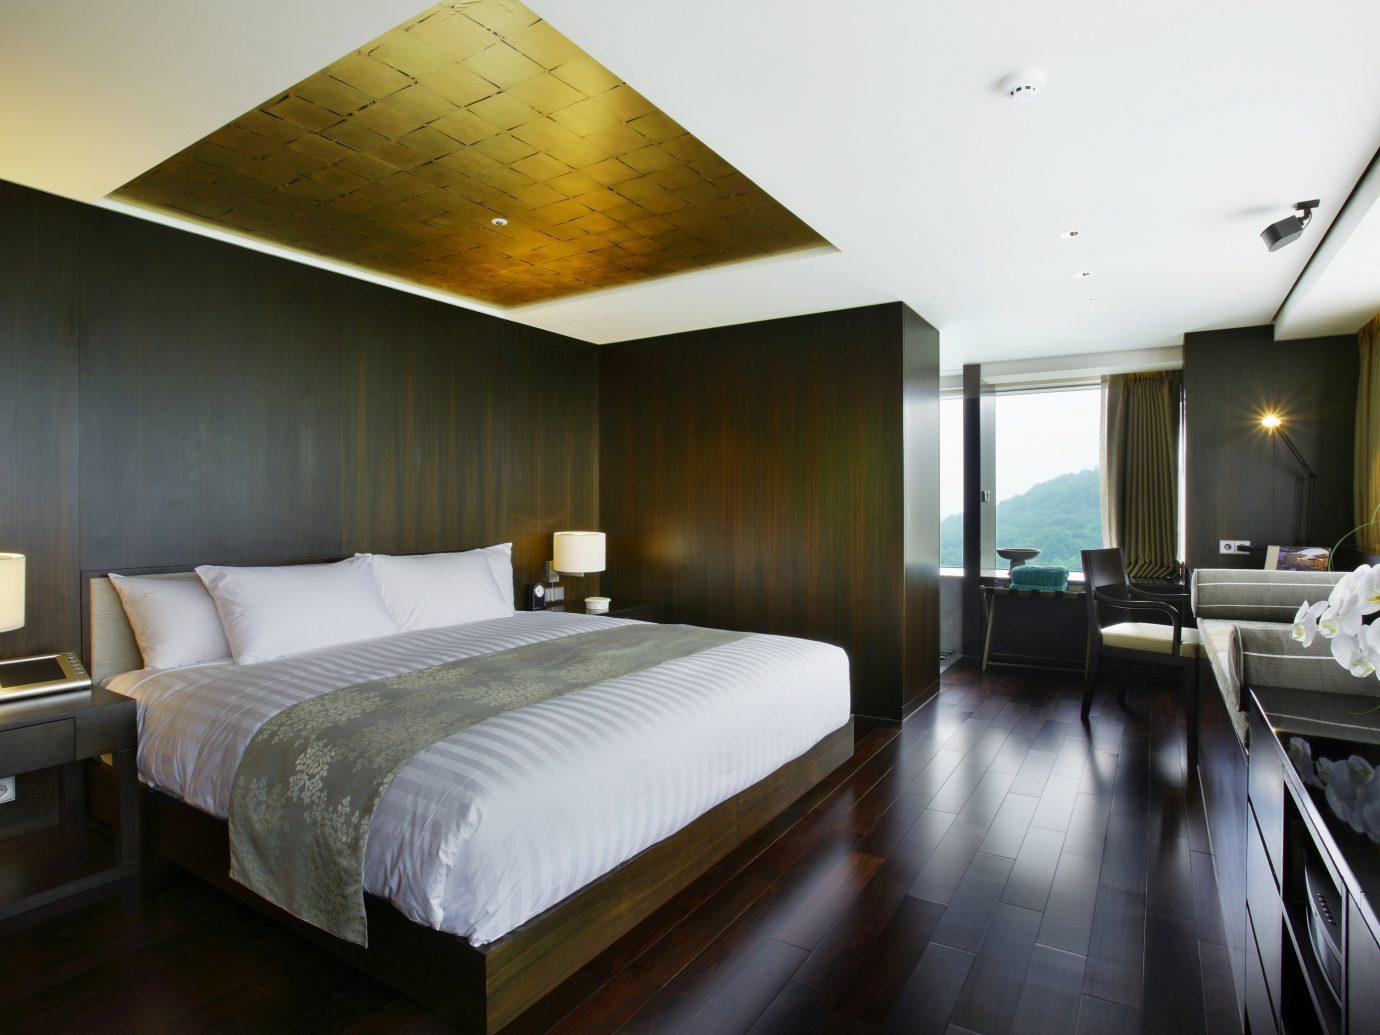 Hotels Luxury Travel indoor bed wall floor ceiling Bedroom room hotel property Suite interior design real estate estate yacht condominium apartment